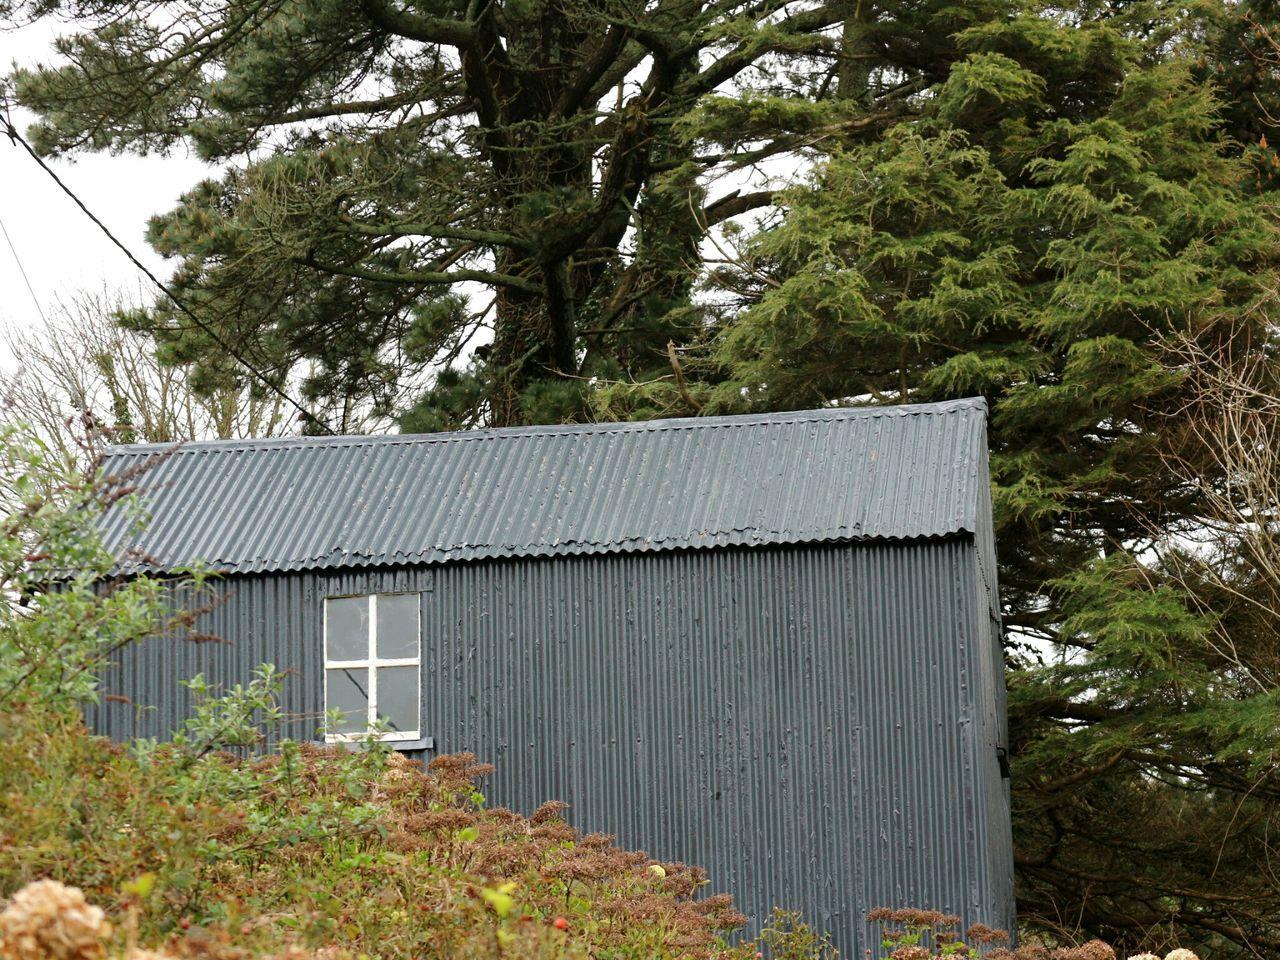 Tin shed Shed Corrugated Iron Grey Color Grey Sky Pine Tree No People Day Outdoors Glandore, Ireland West Cork Wildatlanticway Ireland